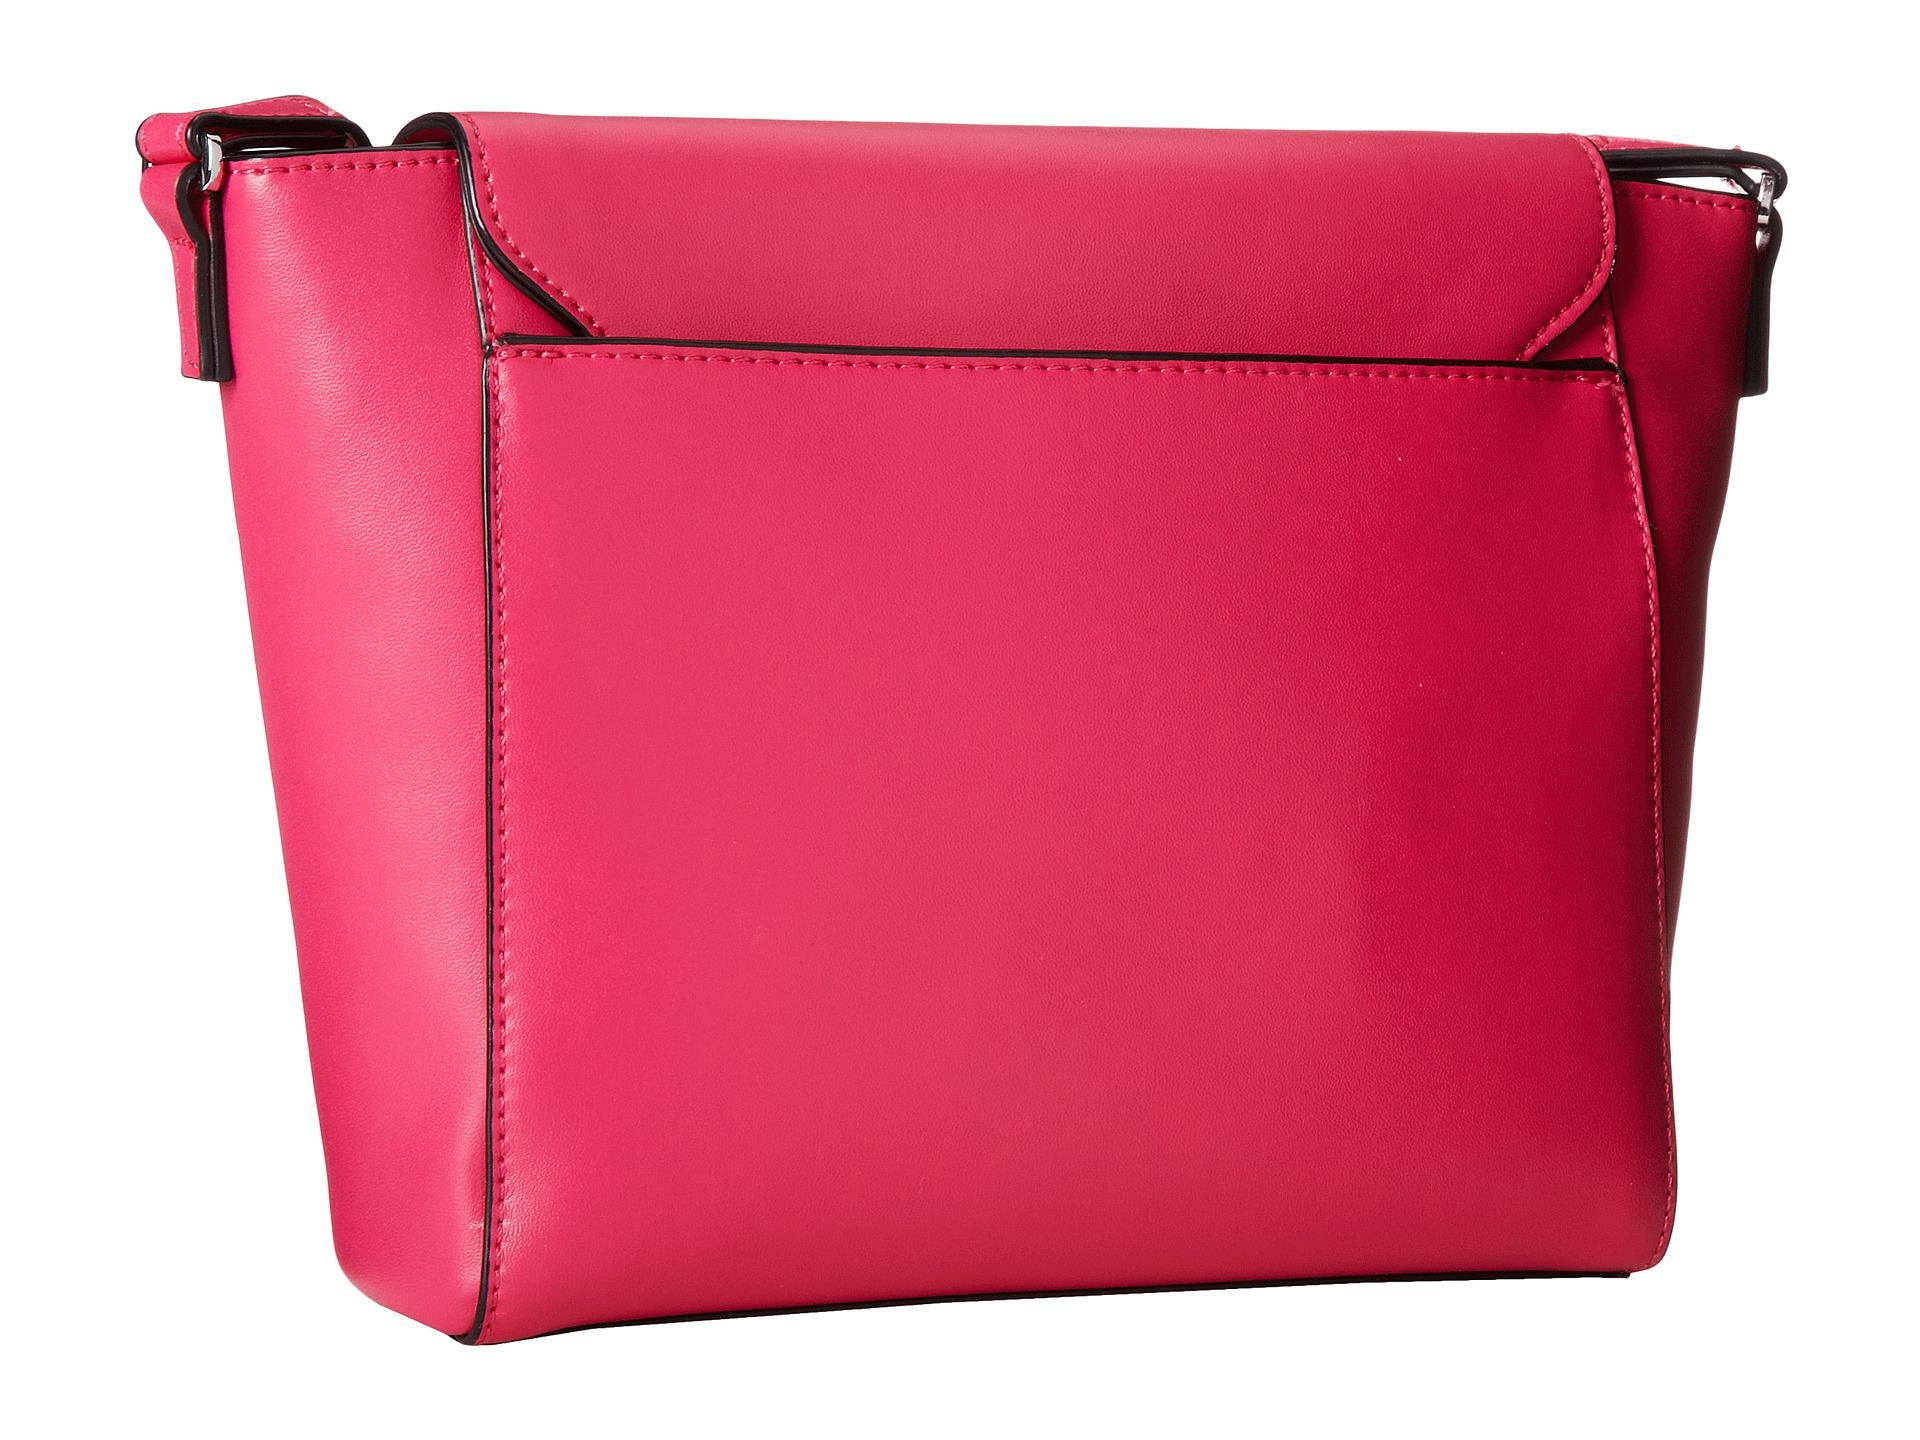 52806ee5d8 Lyst - Vera Bradley Solid Pu Flap Crossbody in Pink